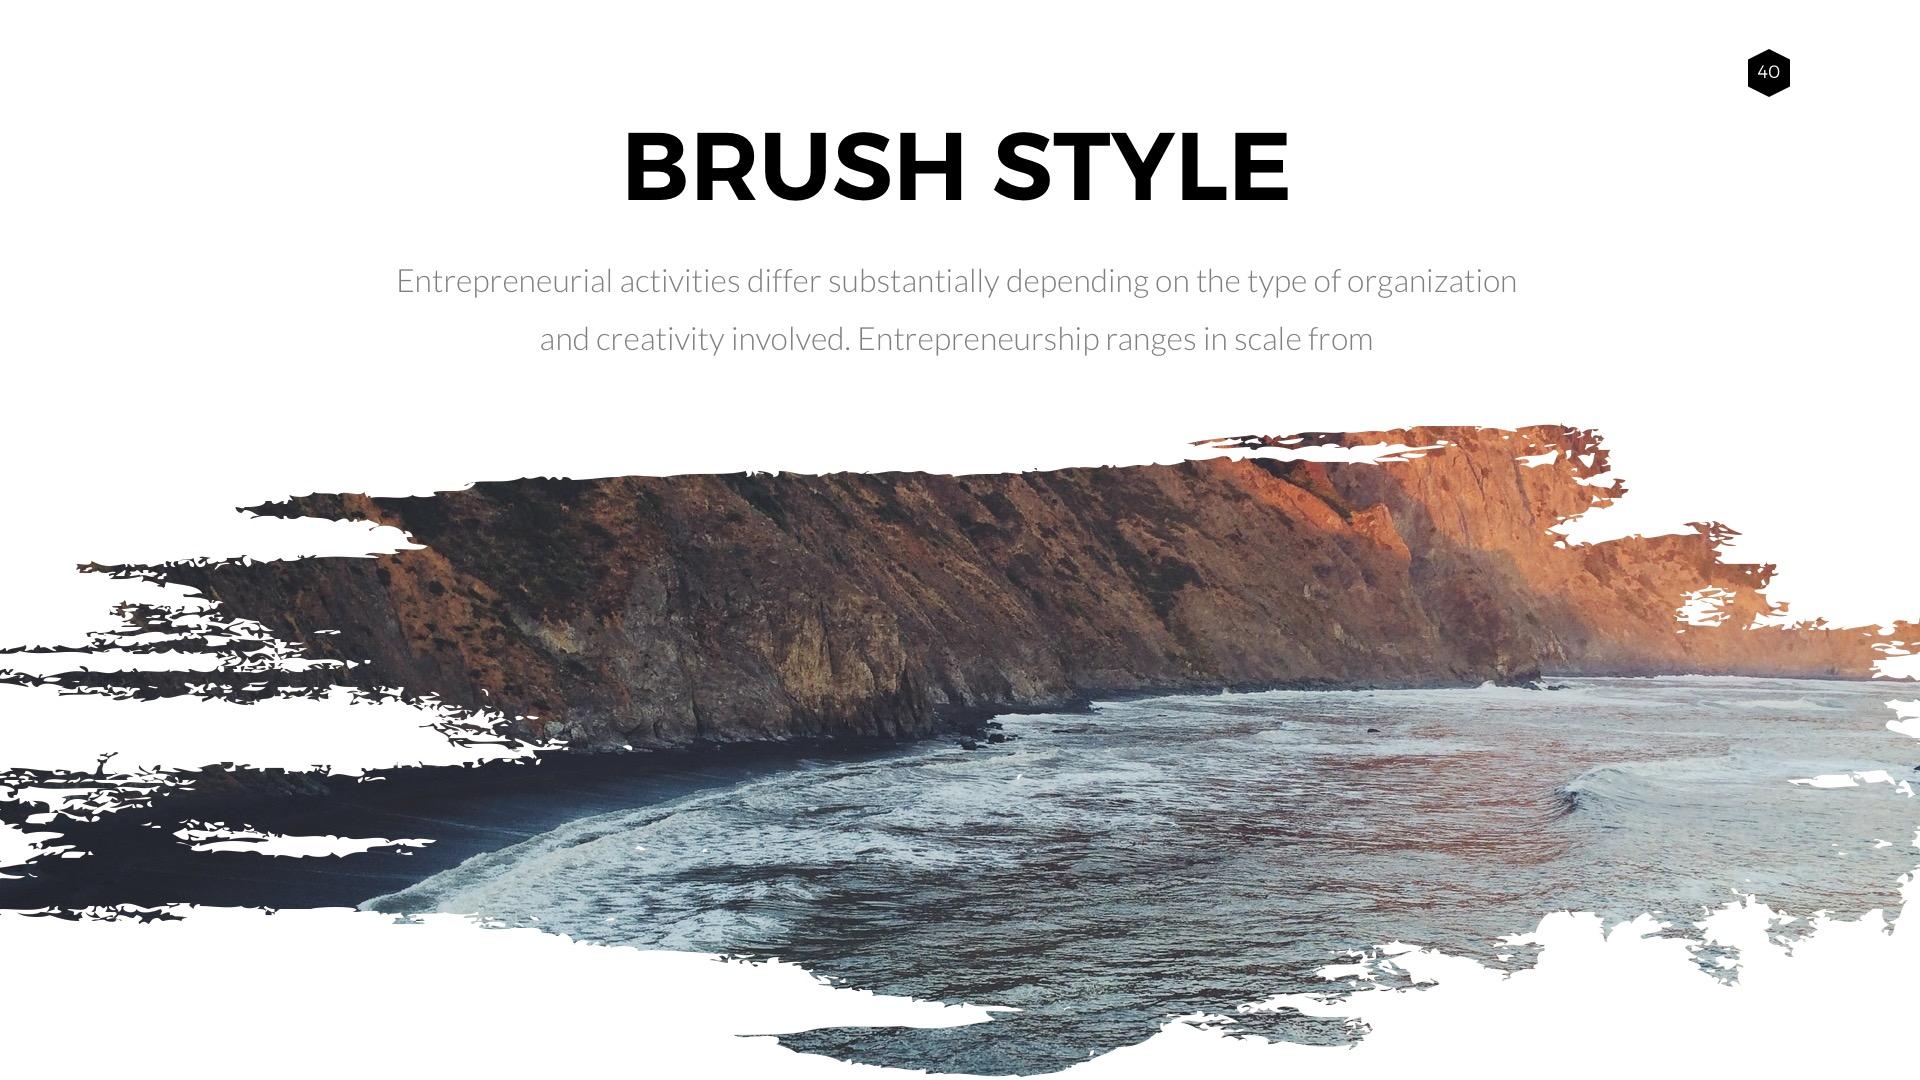 Prism minimal powerpoint template builder by louistwelve design prism minimal powerpoint template builder toneelgroepblik Image collections